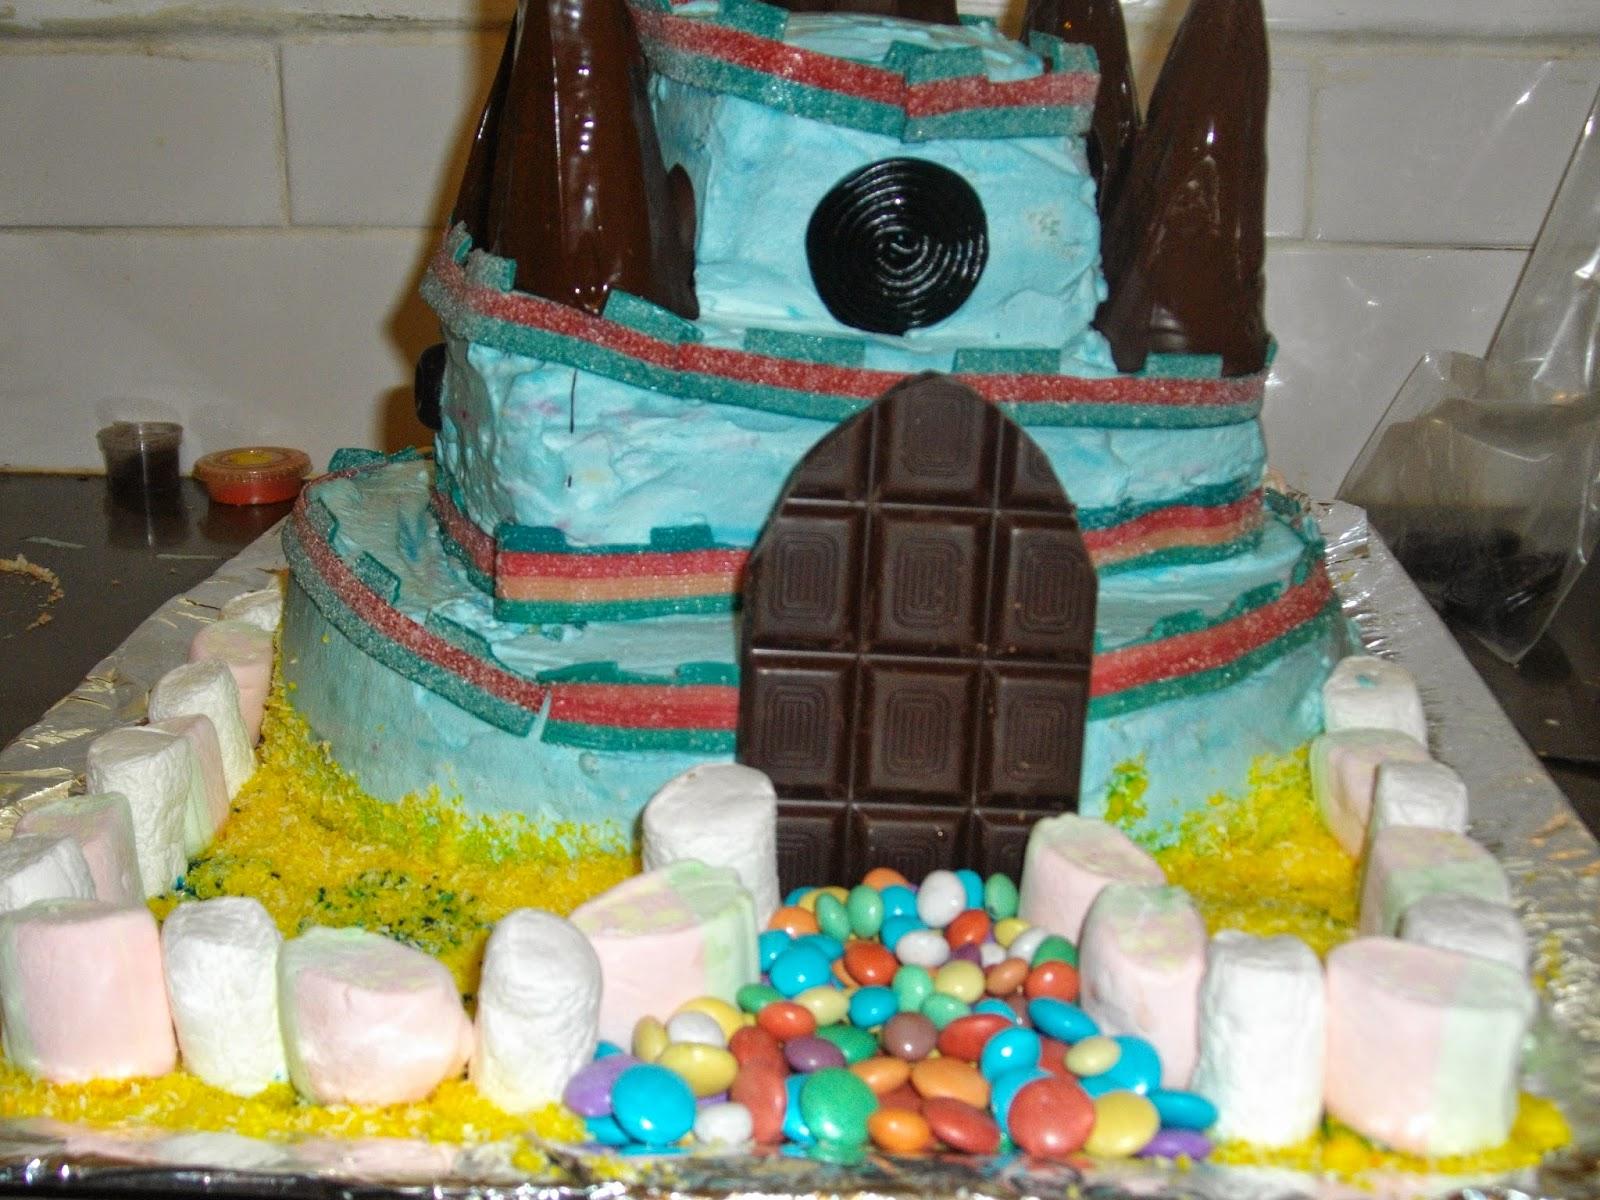 IMGP2884 - עוגת יומולדת בצורת ארמון